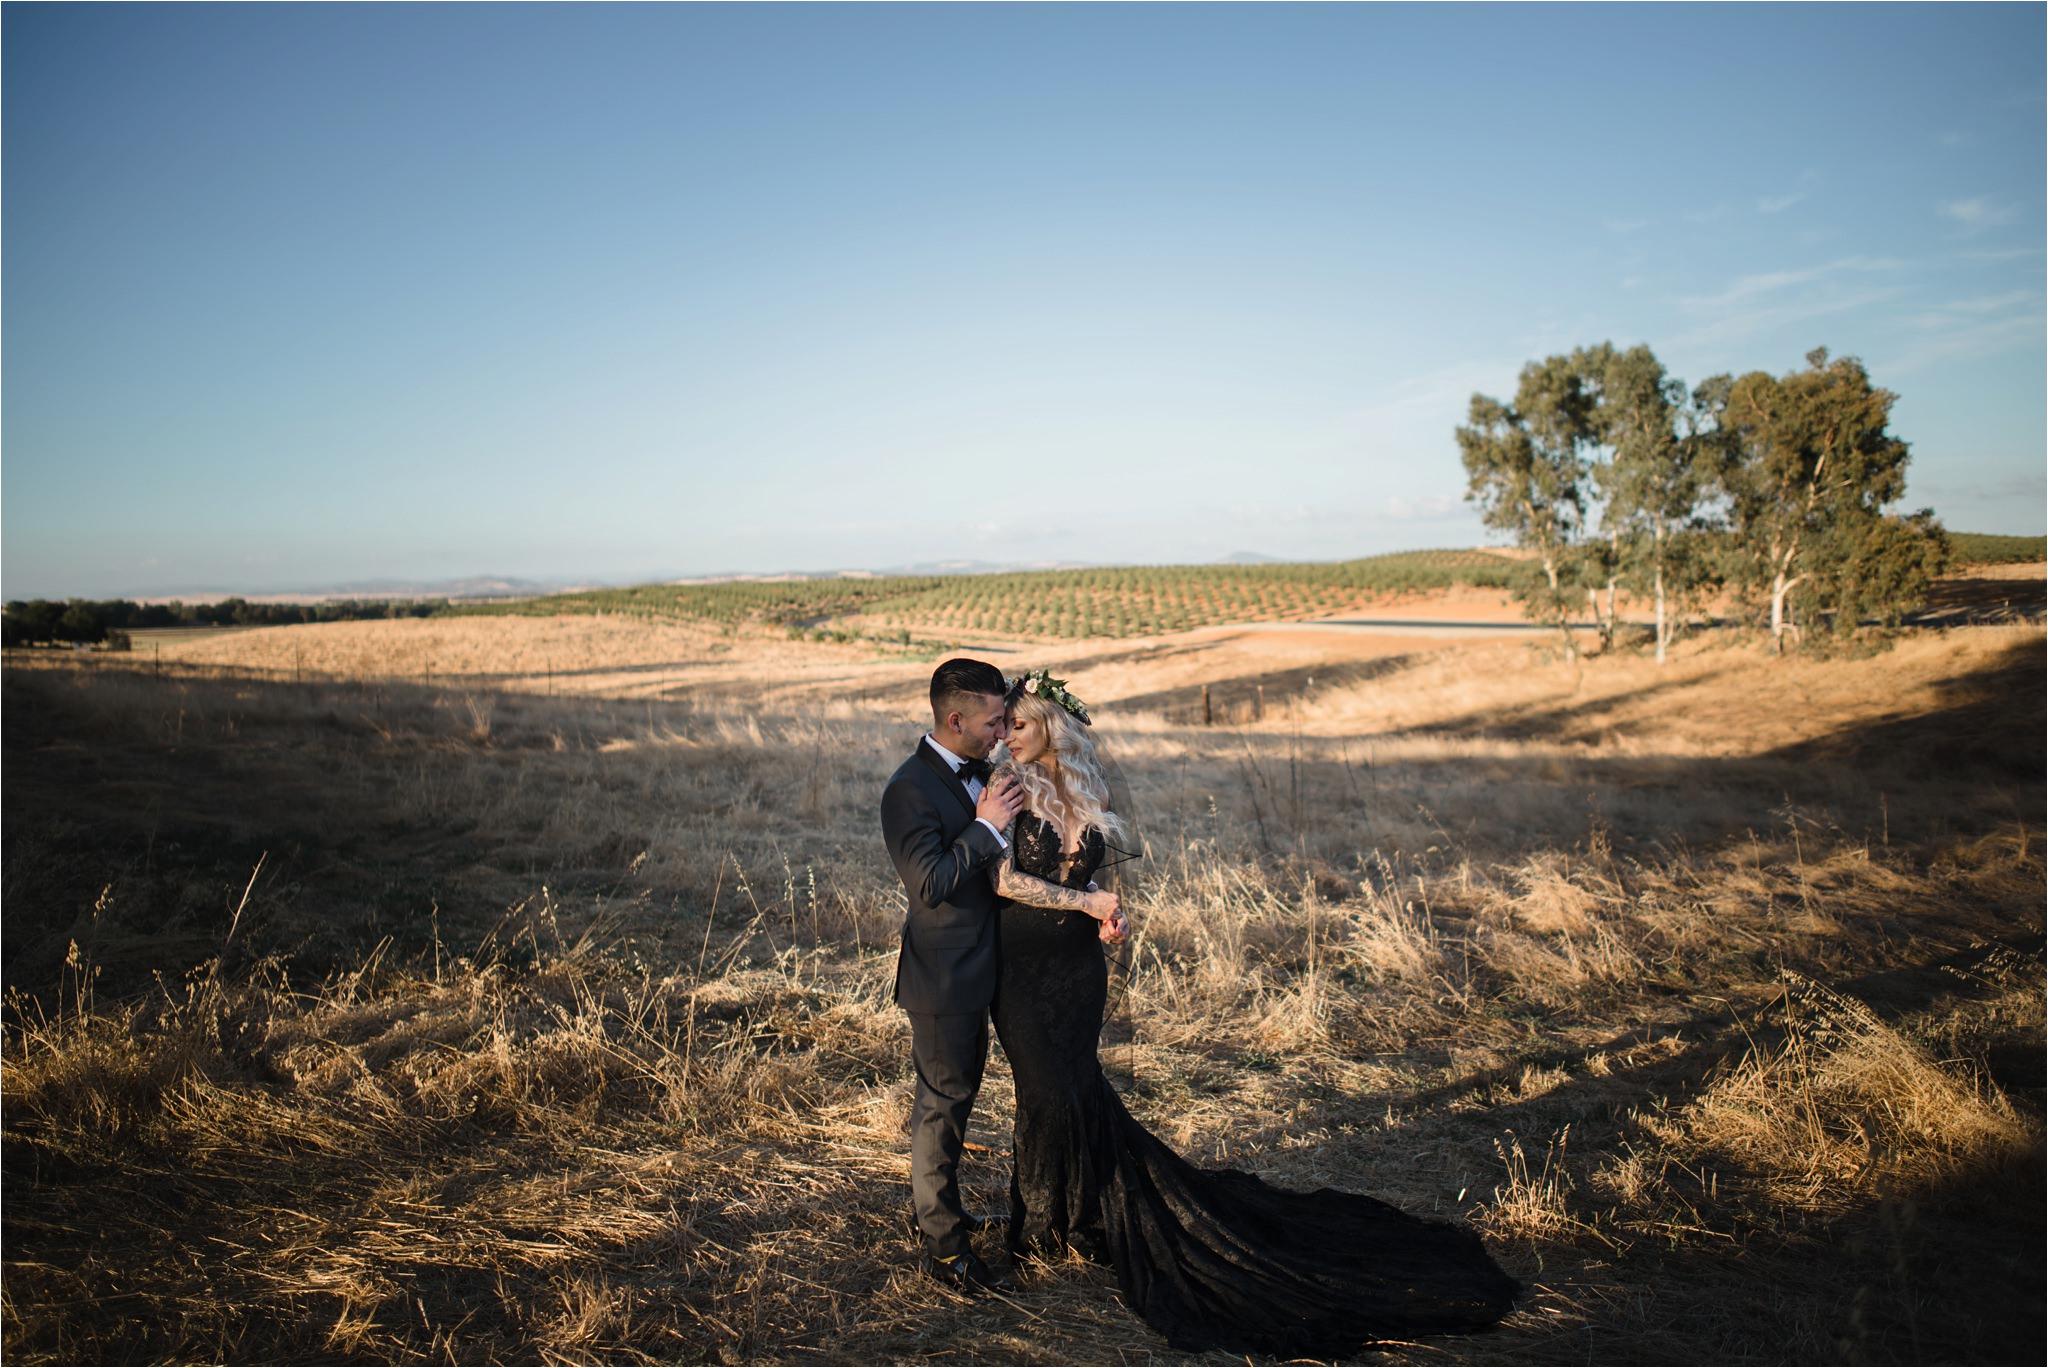 jessica-roman-photography-Stone Barn Ranch Wedding-Sacramento-Boise-Photographer-0015.jpg